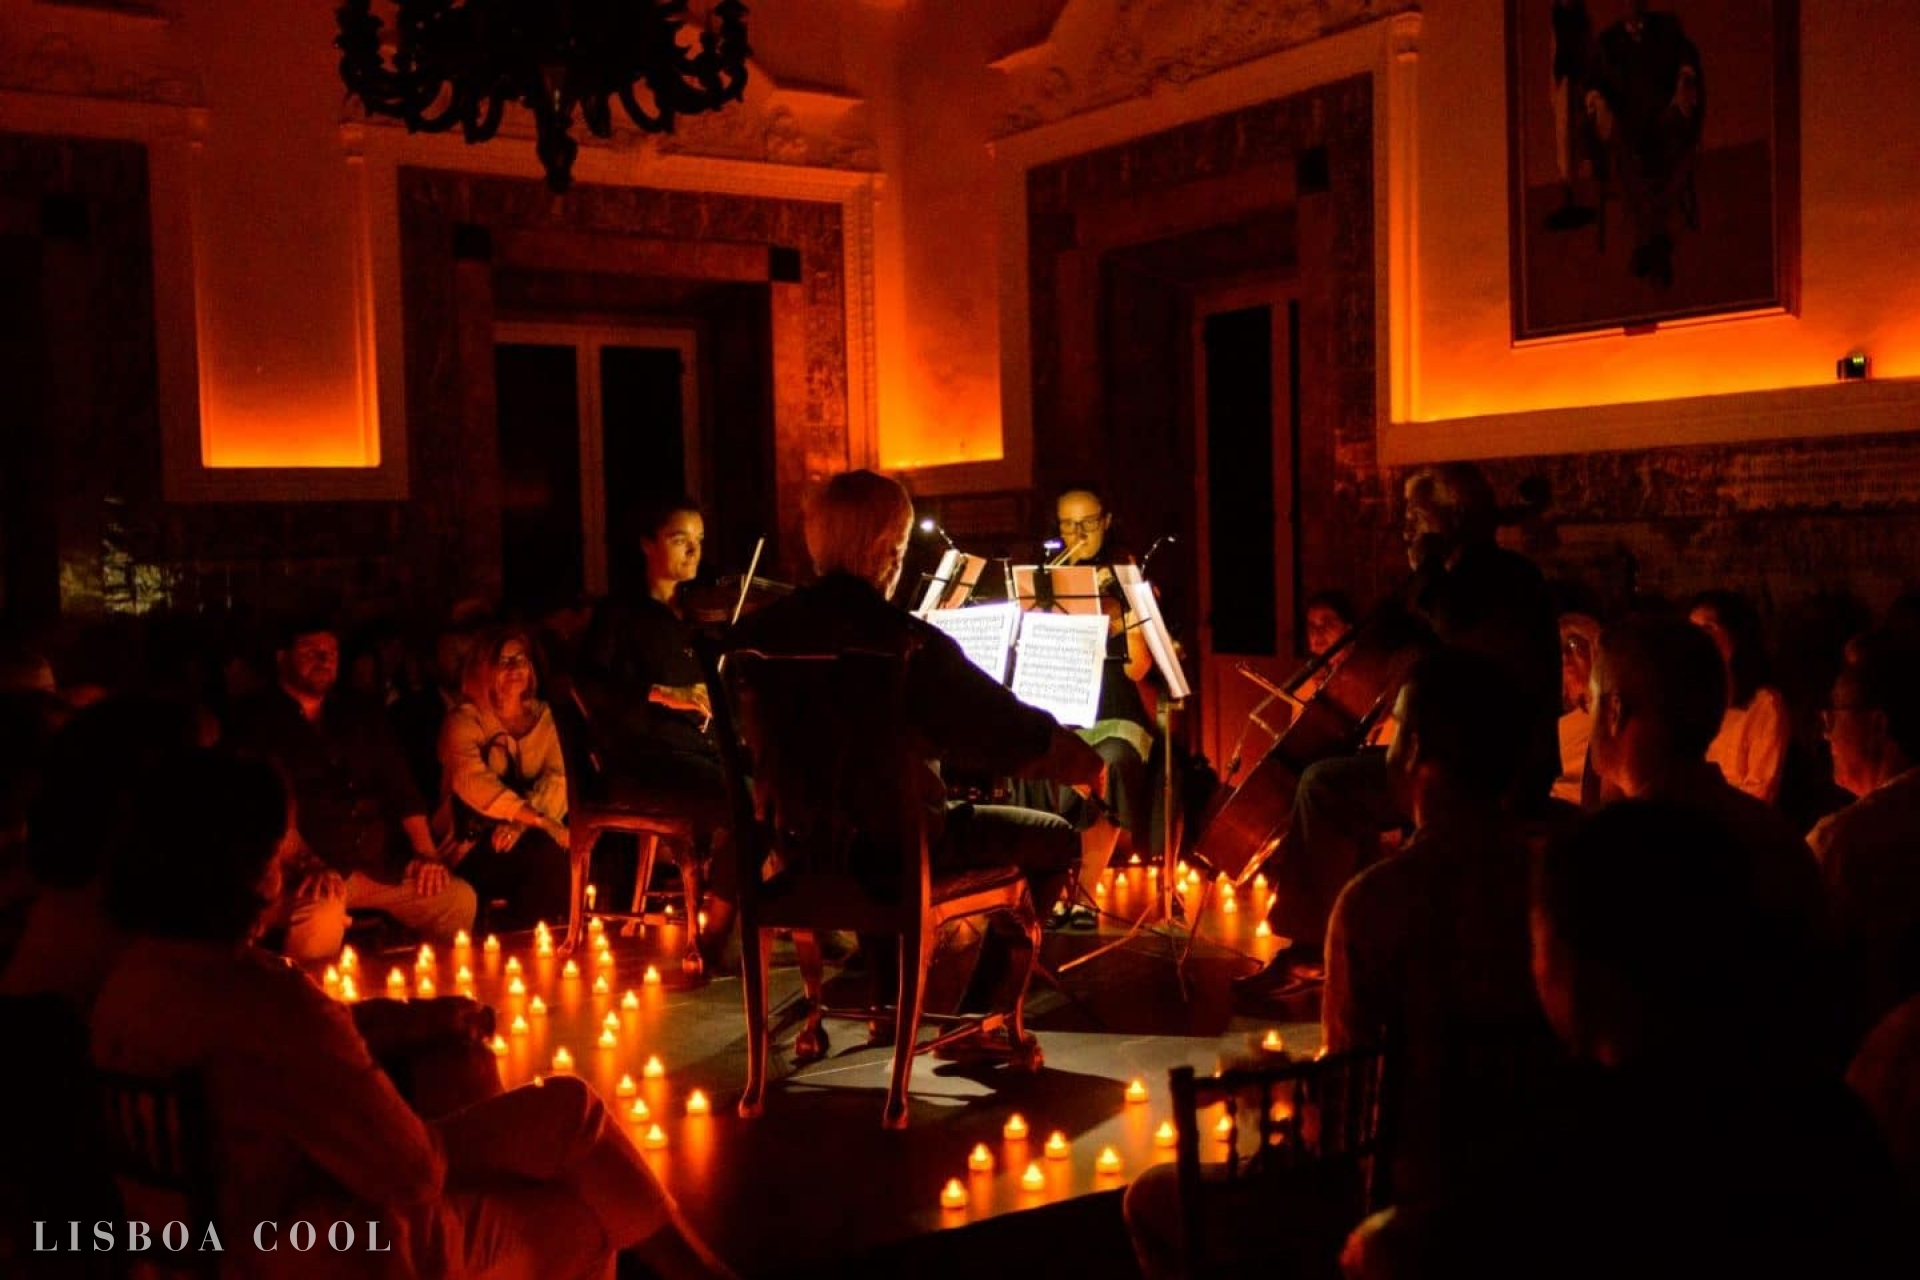 LC_blog_Fantasma_Opera_Luz_Velas_chega_Lisboa